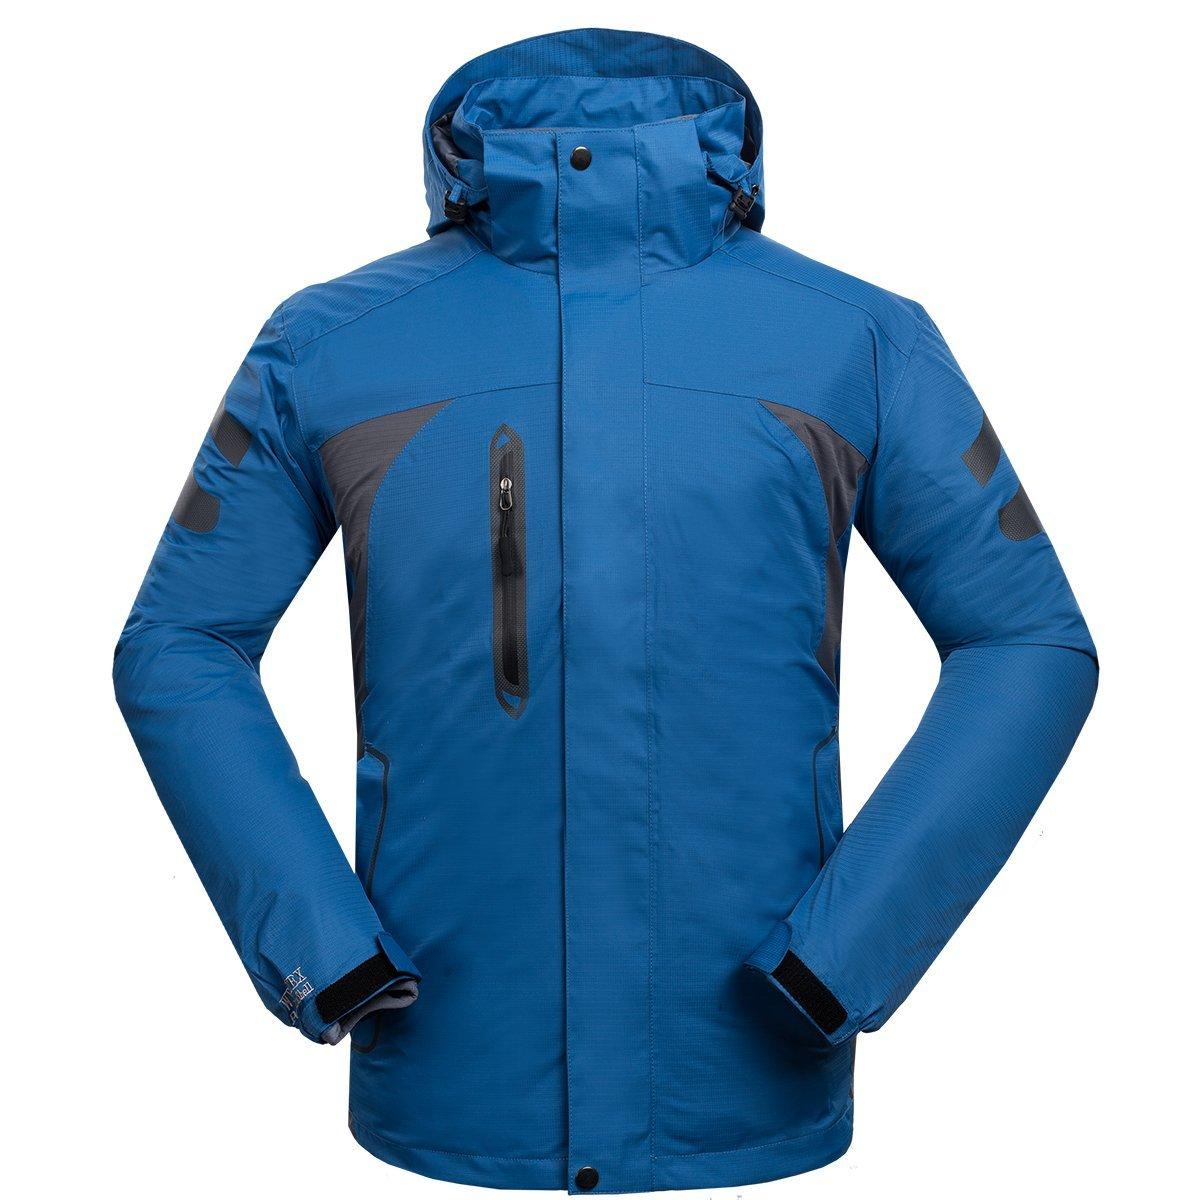 Emansmoer Herren 3 in 1 Winddicht Kapuzen Wasserdicht Atmungsaktiv Sport Outdoor Jacke Camping Wandern Trekking Mantel